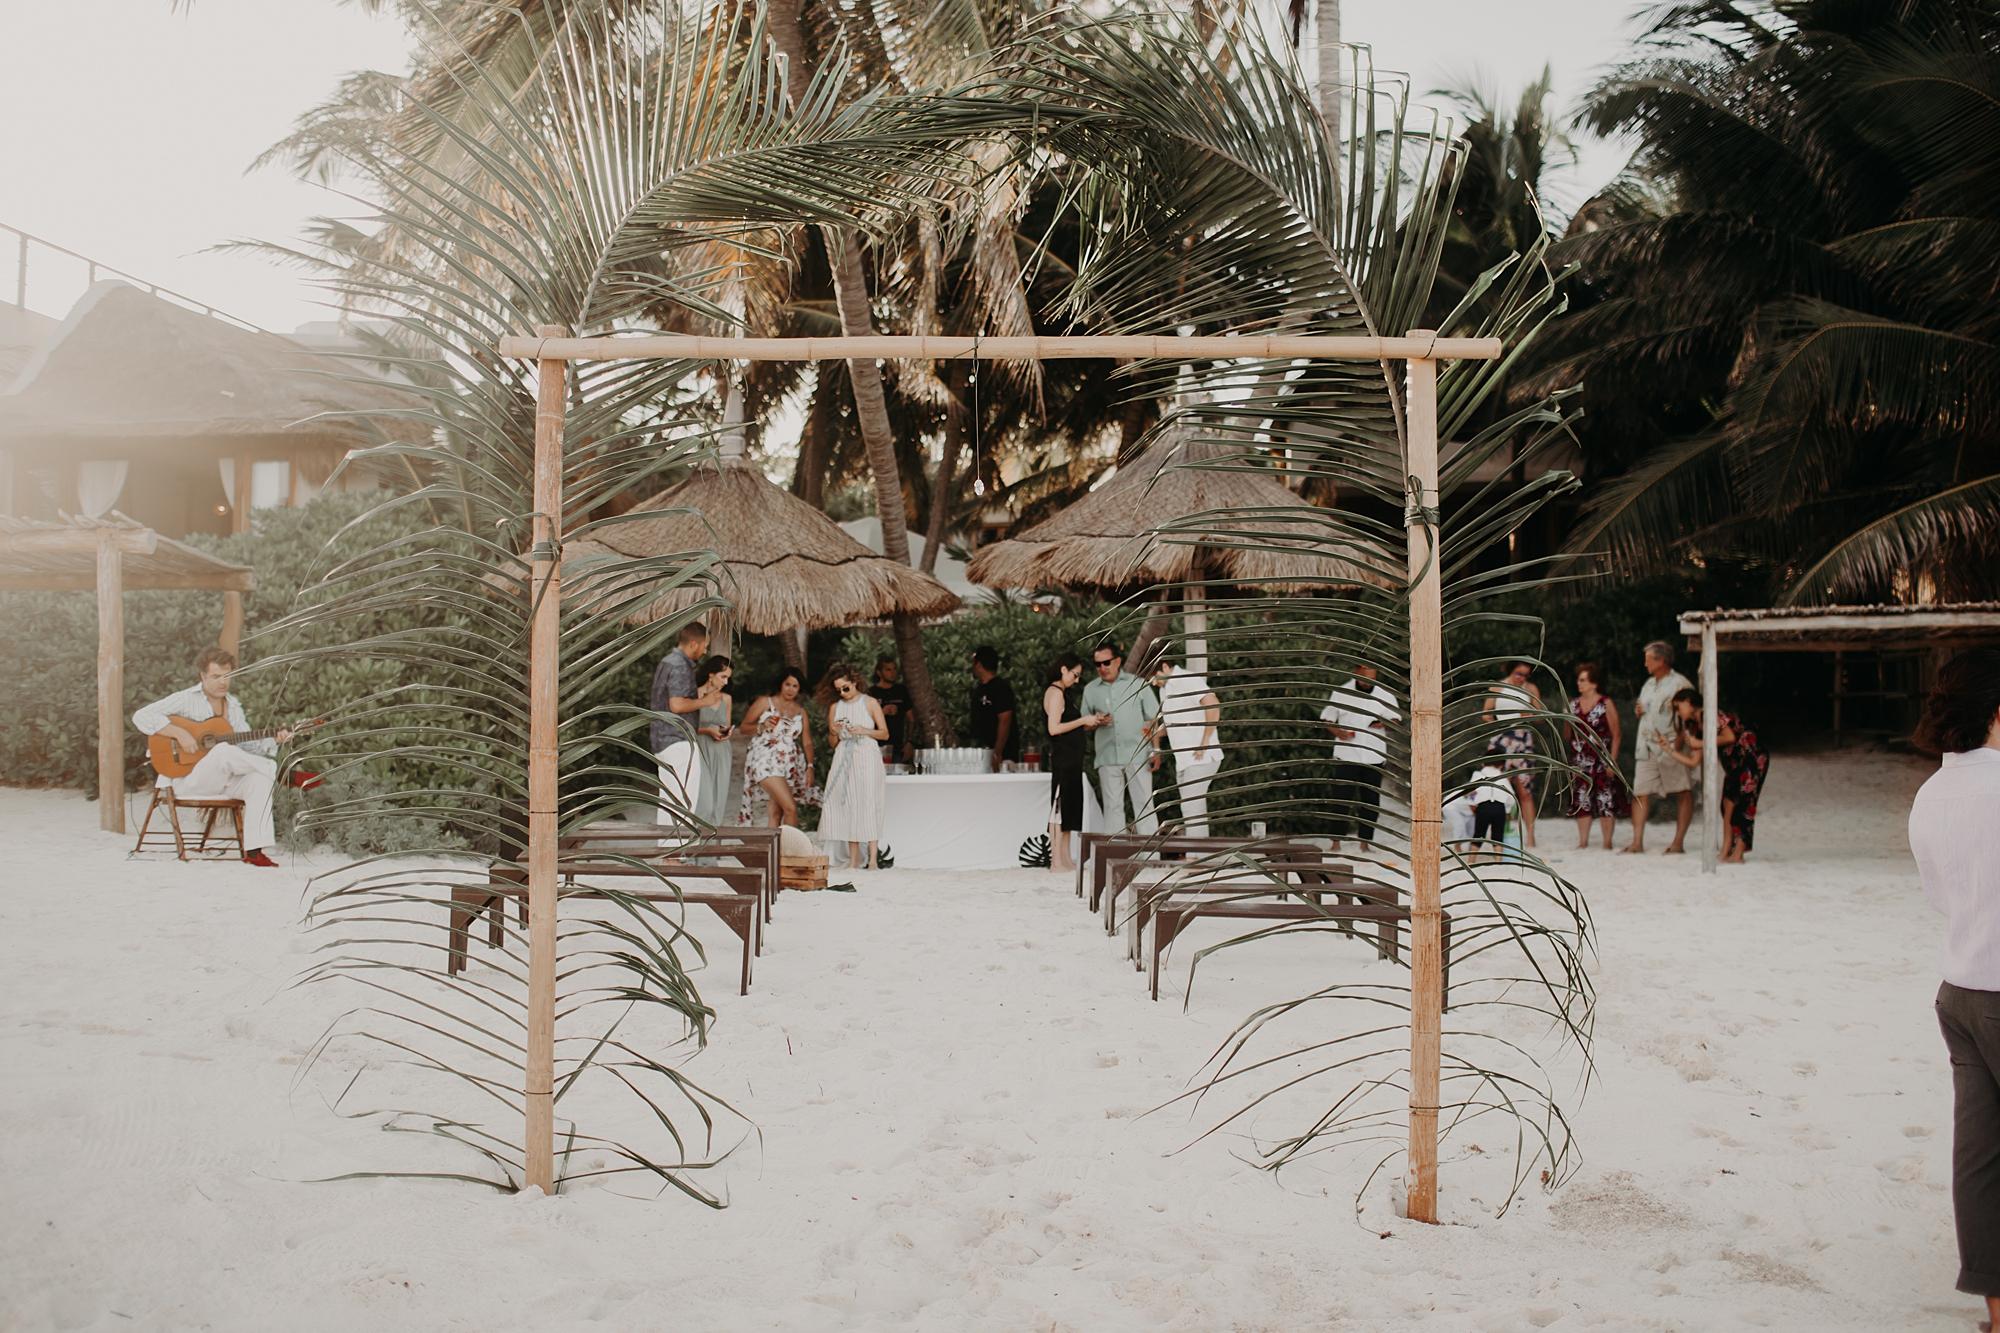 Danielle-San-Antonio-Wedding-Photographer-132_WEB.jpg